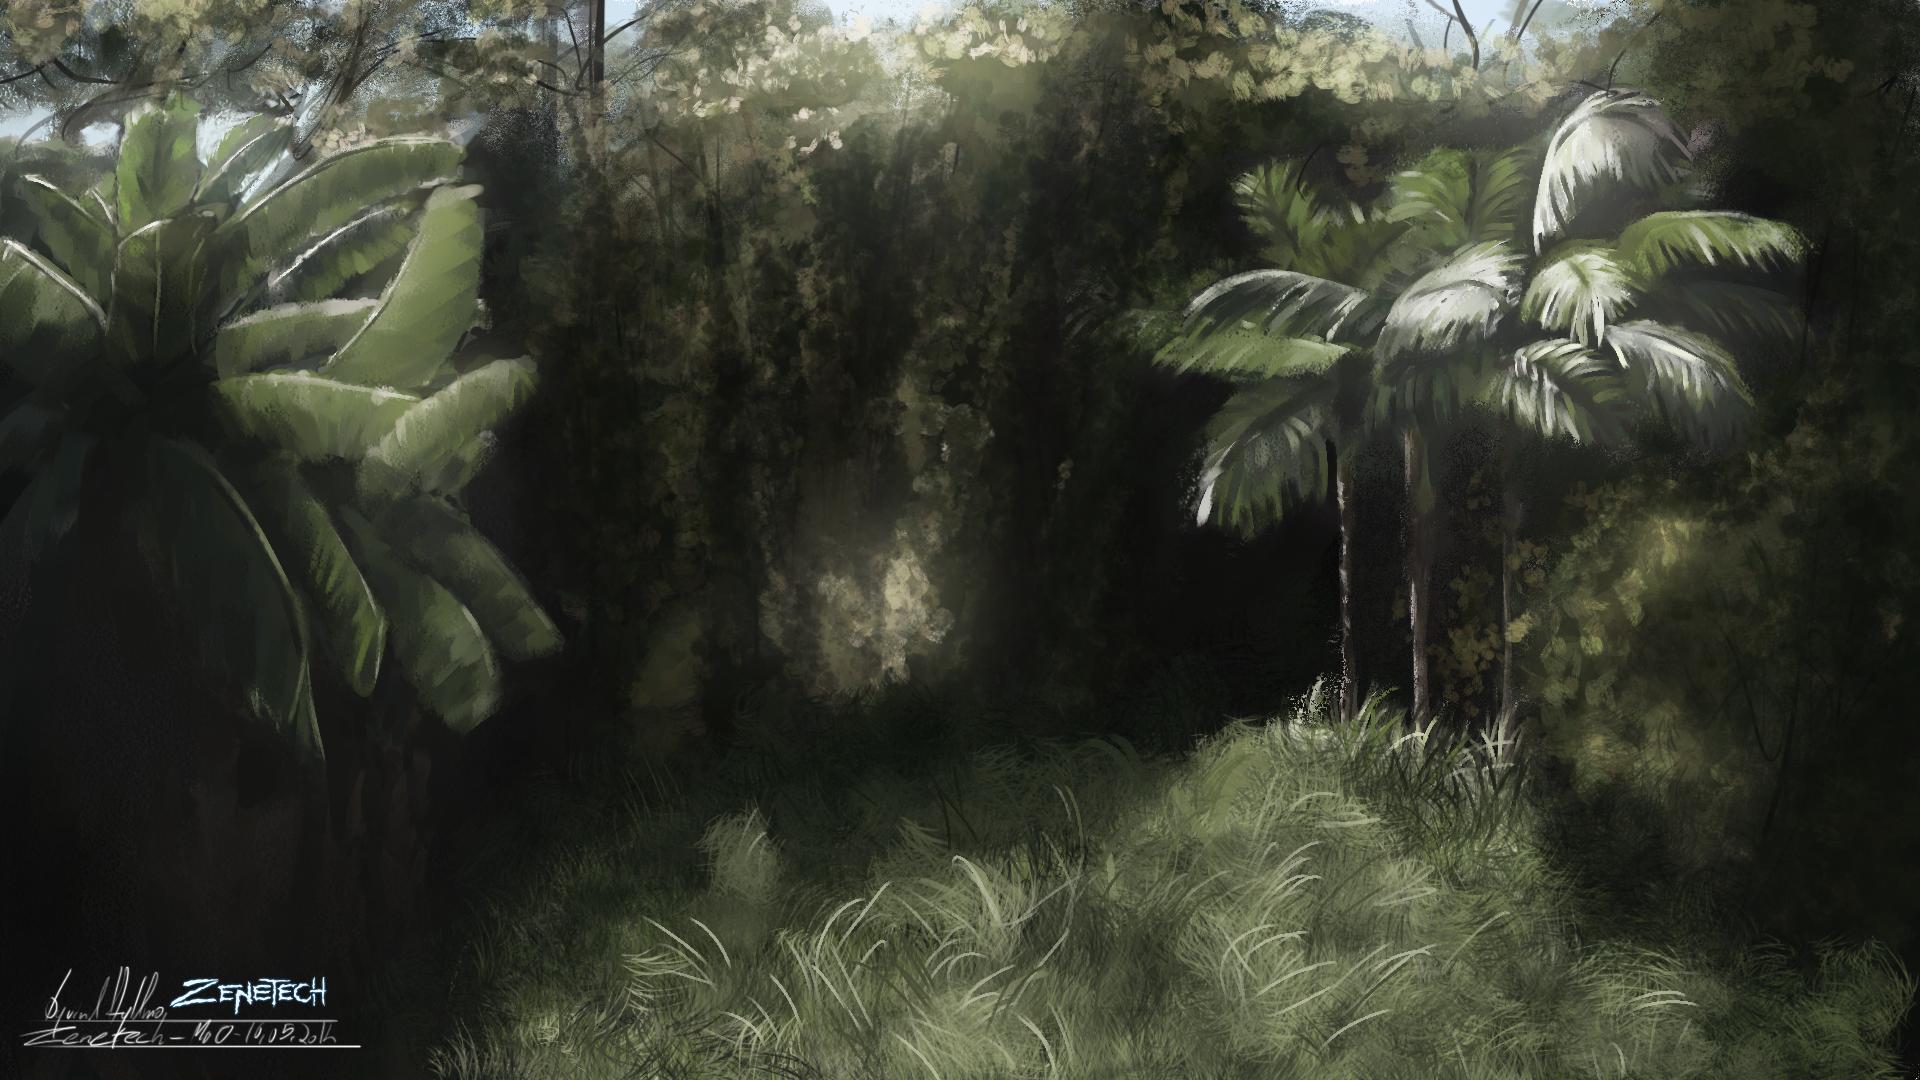 Men of Oath - Jungle Concept Art image - Mod DB